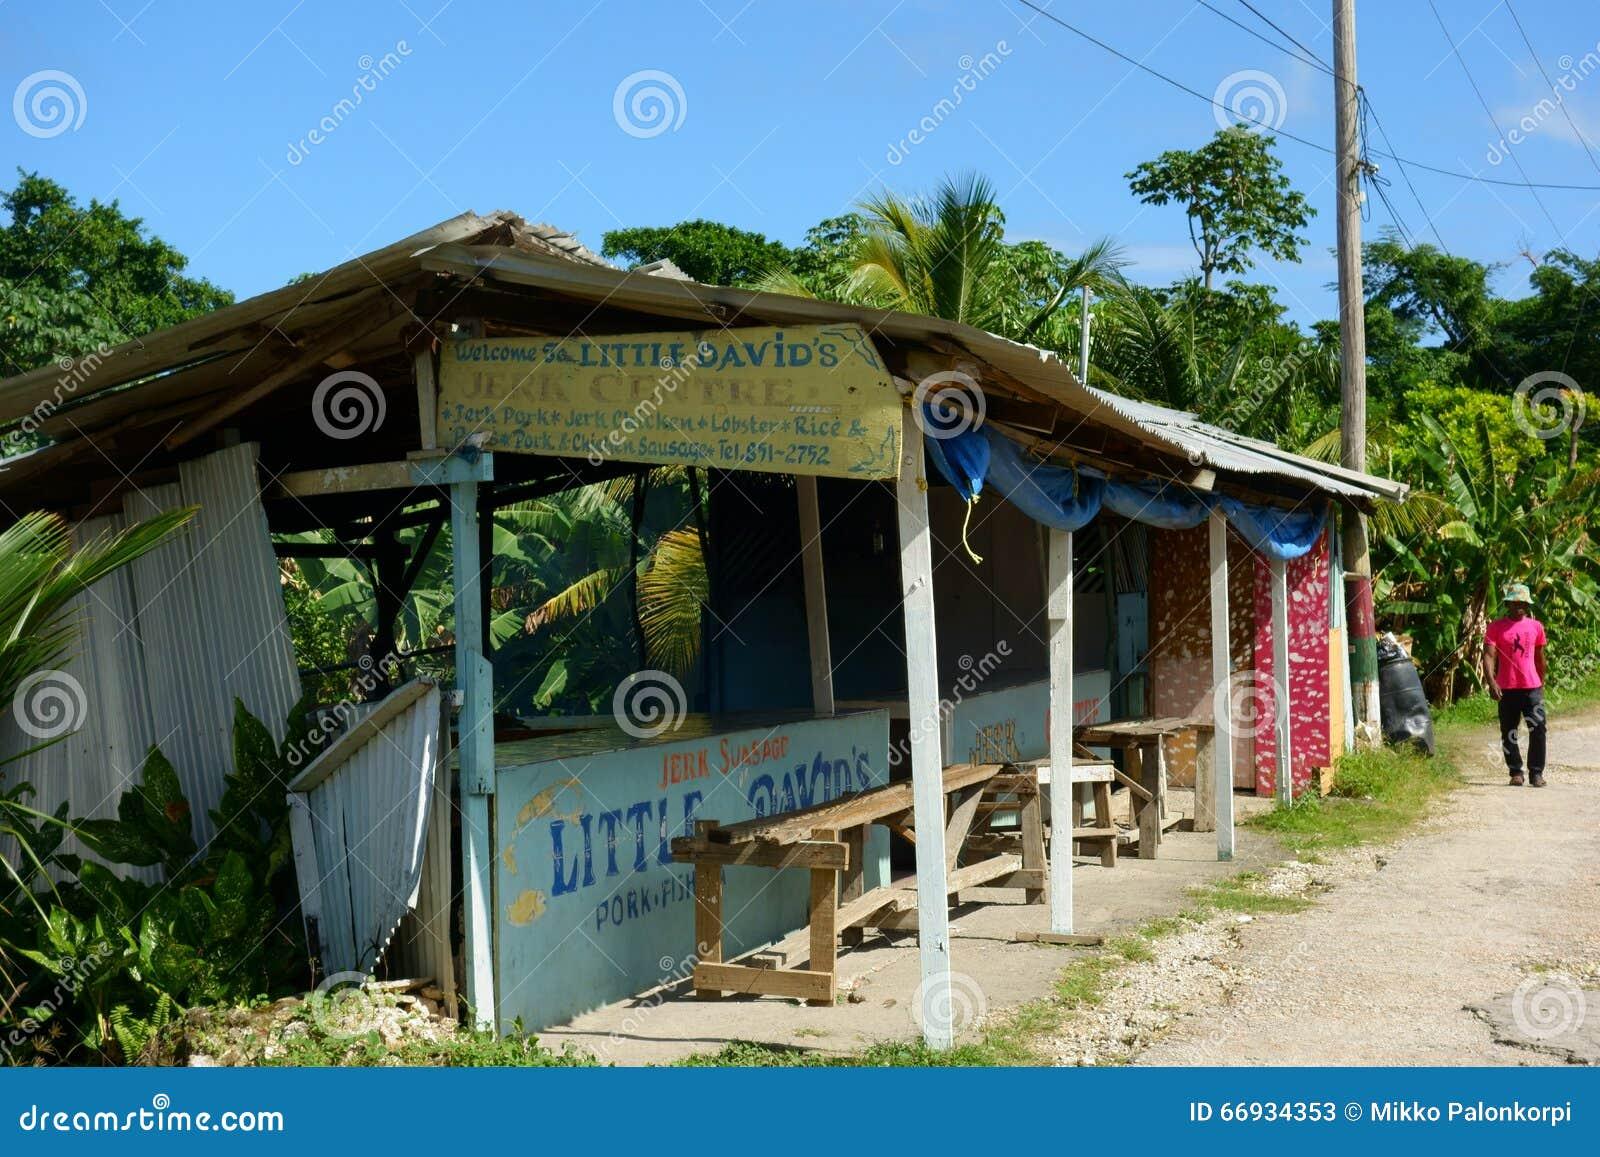 Weinig David's-Schokcentrum in de Baai van Boston, Jamaïca